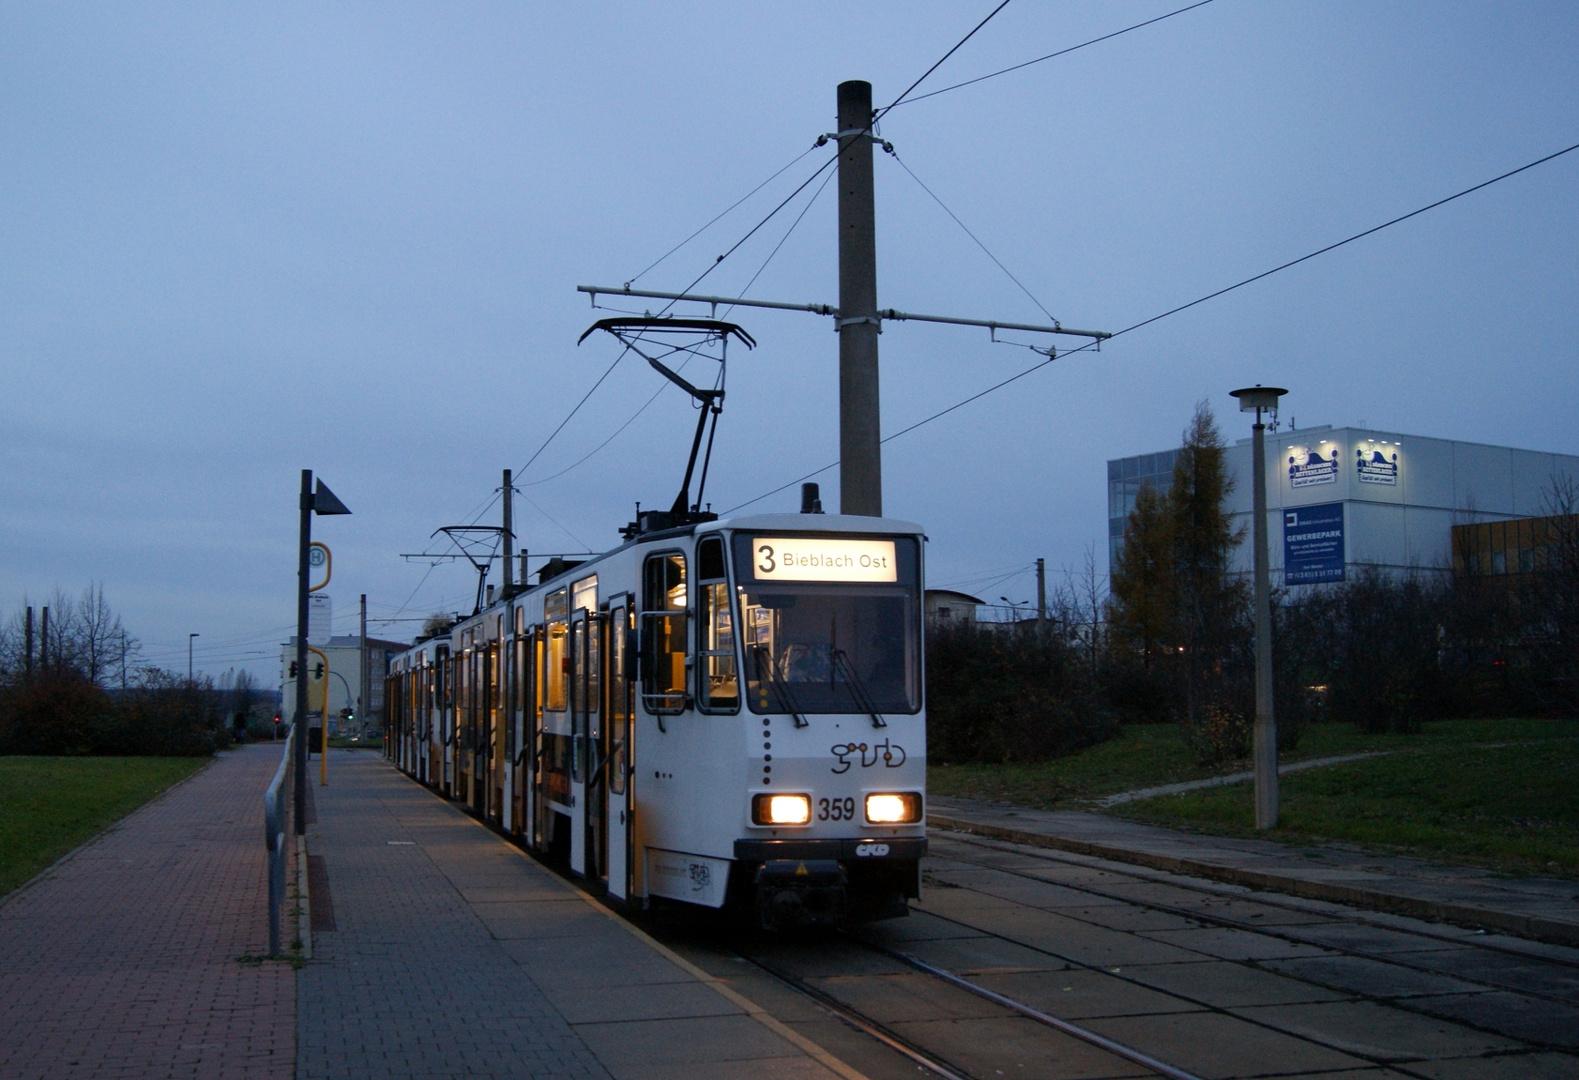 Bieblach-Ost